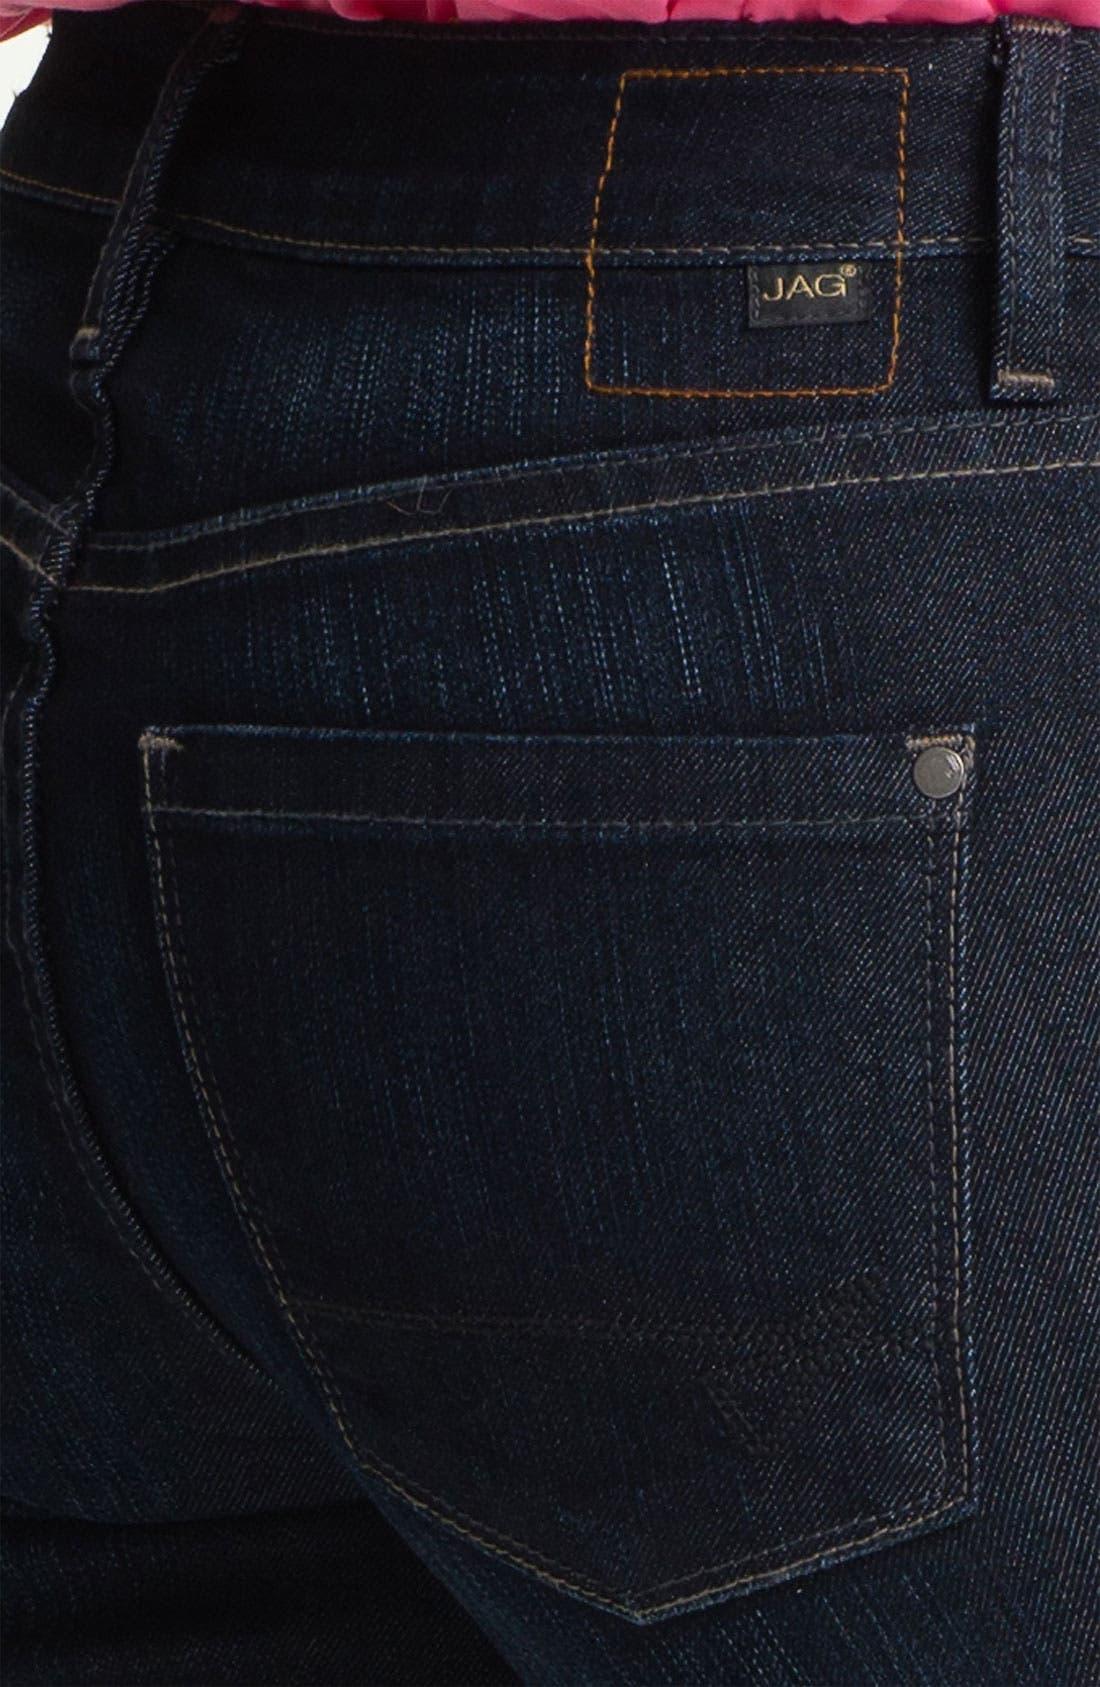 Alternate Image 3  - Jag Jeans 'Reece' Skinny Jeans (Petite)